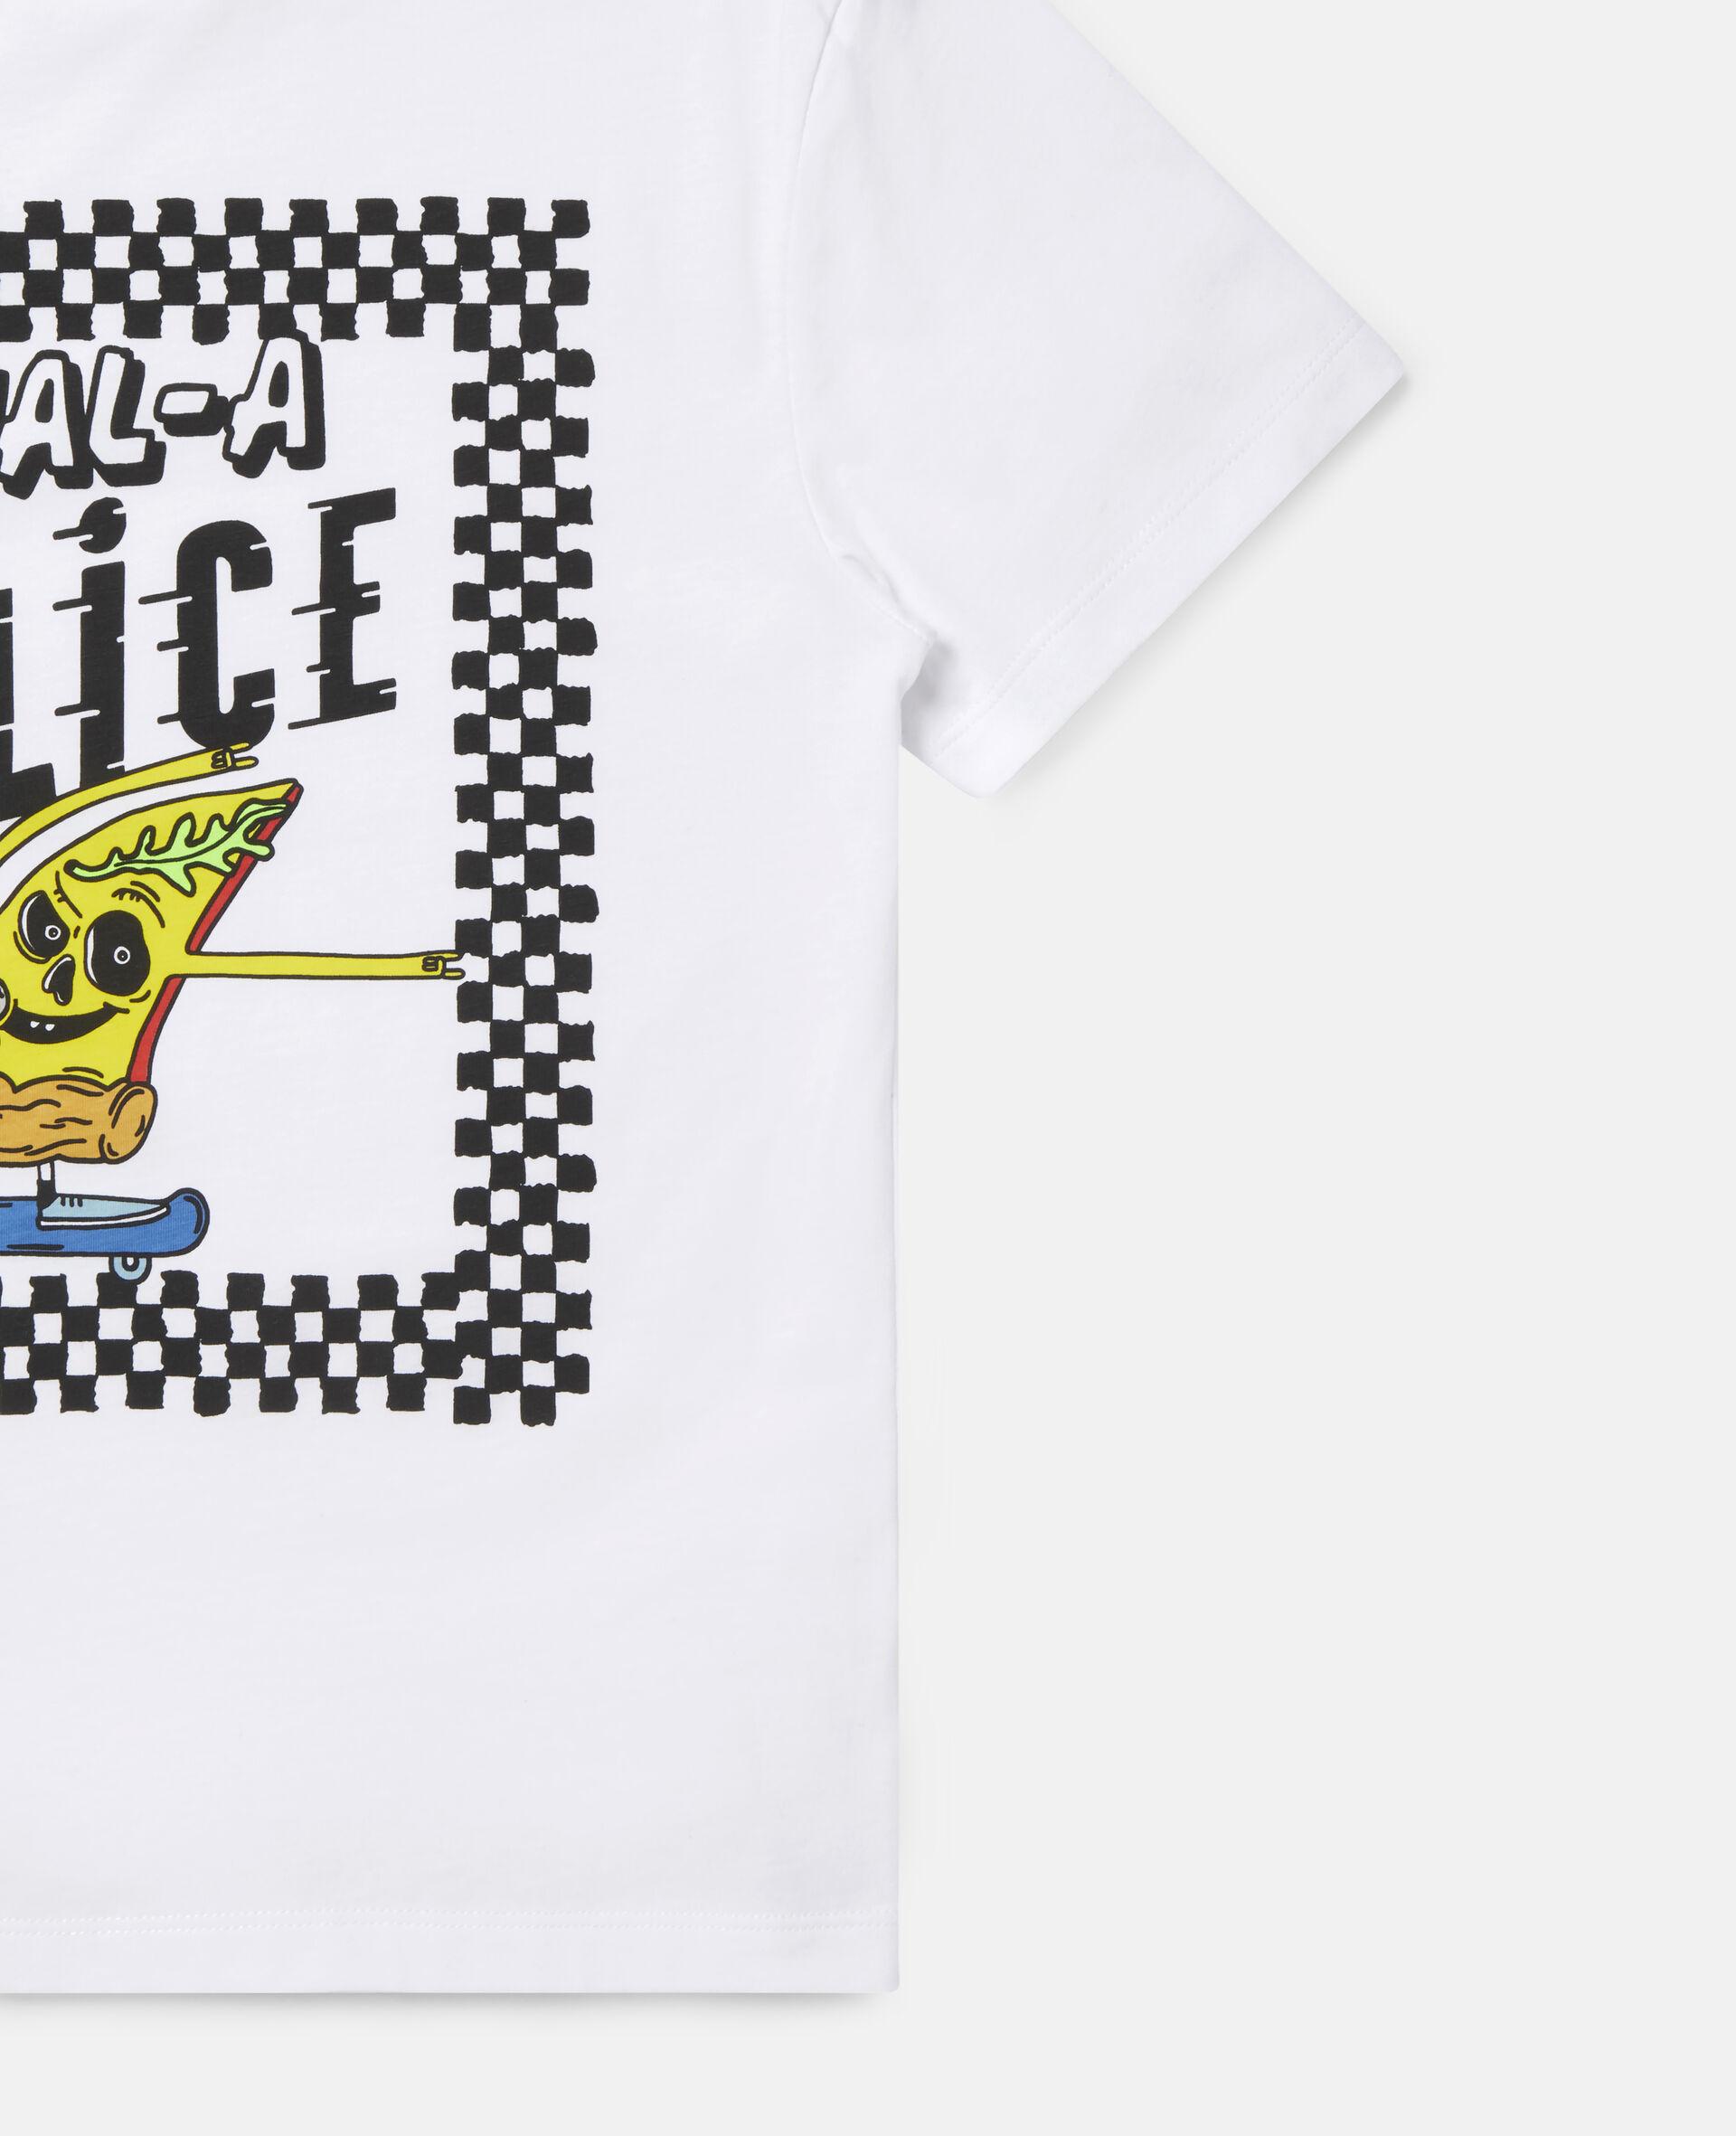 披萨滑板运动员超大号棉质T恤 -白色-large image number 1